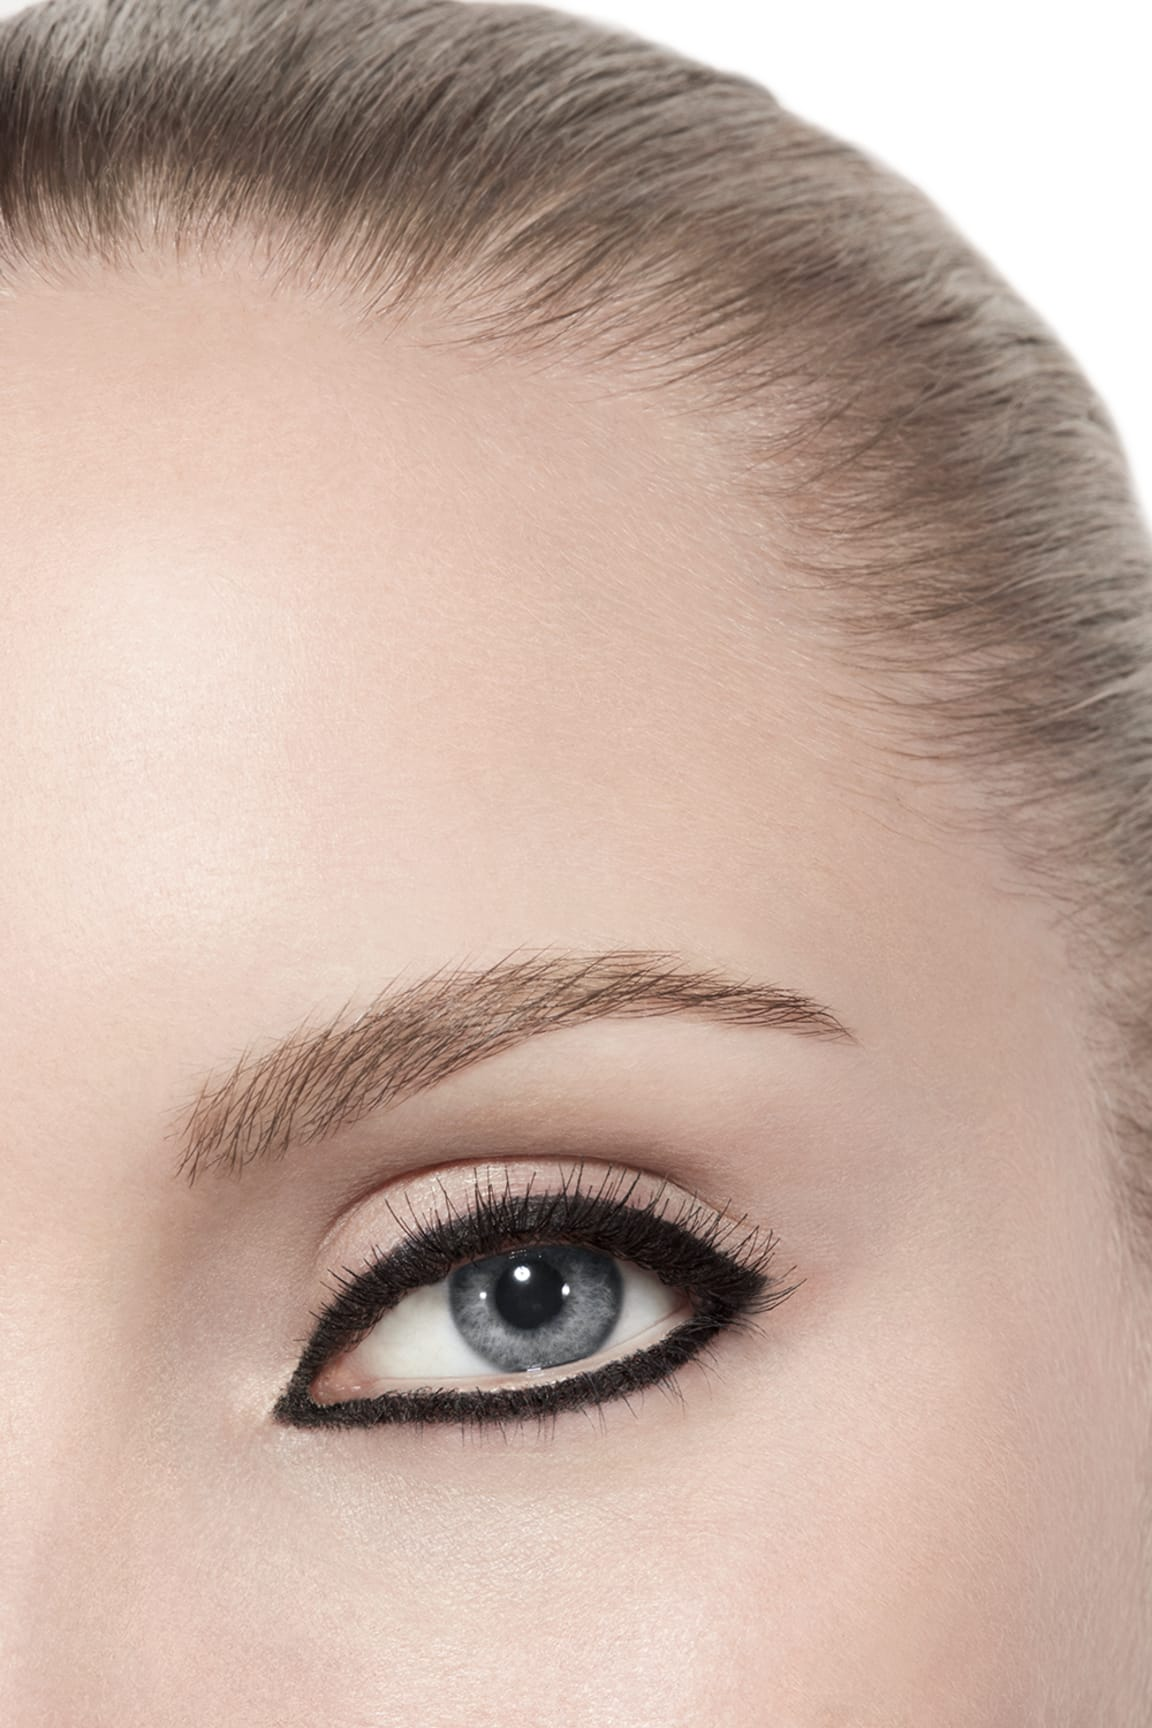 Application makeup visual 3 - STYLO YEUX WATERPROOF 88 - NOIR INTENSE